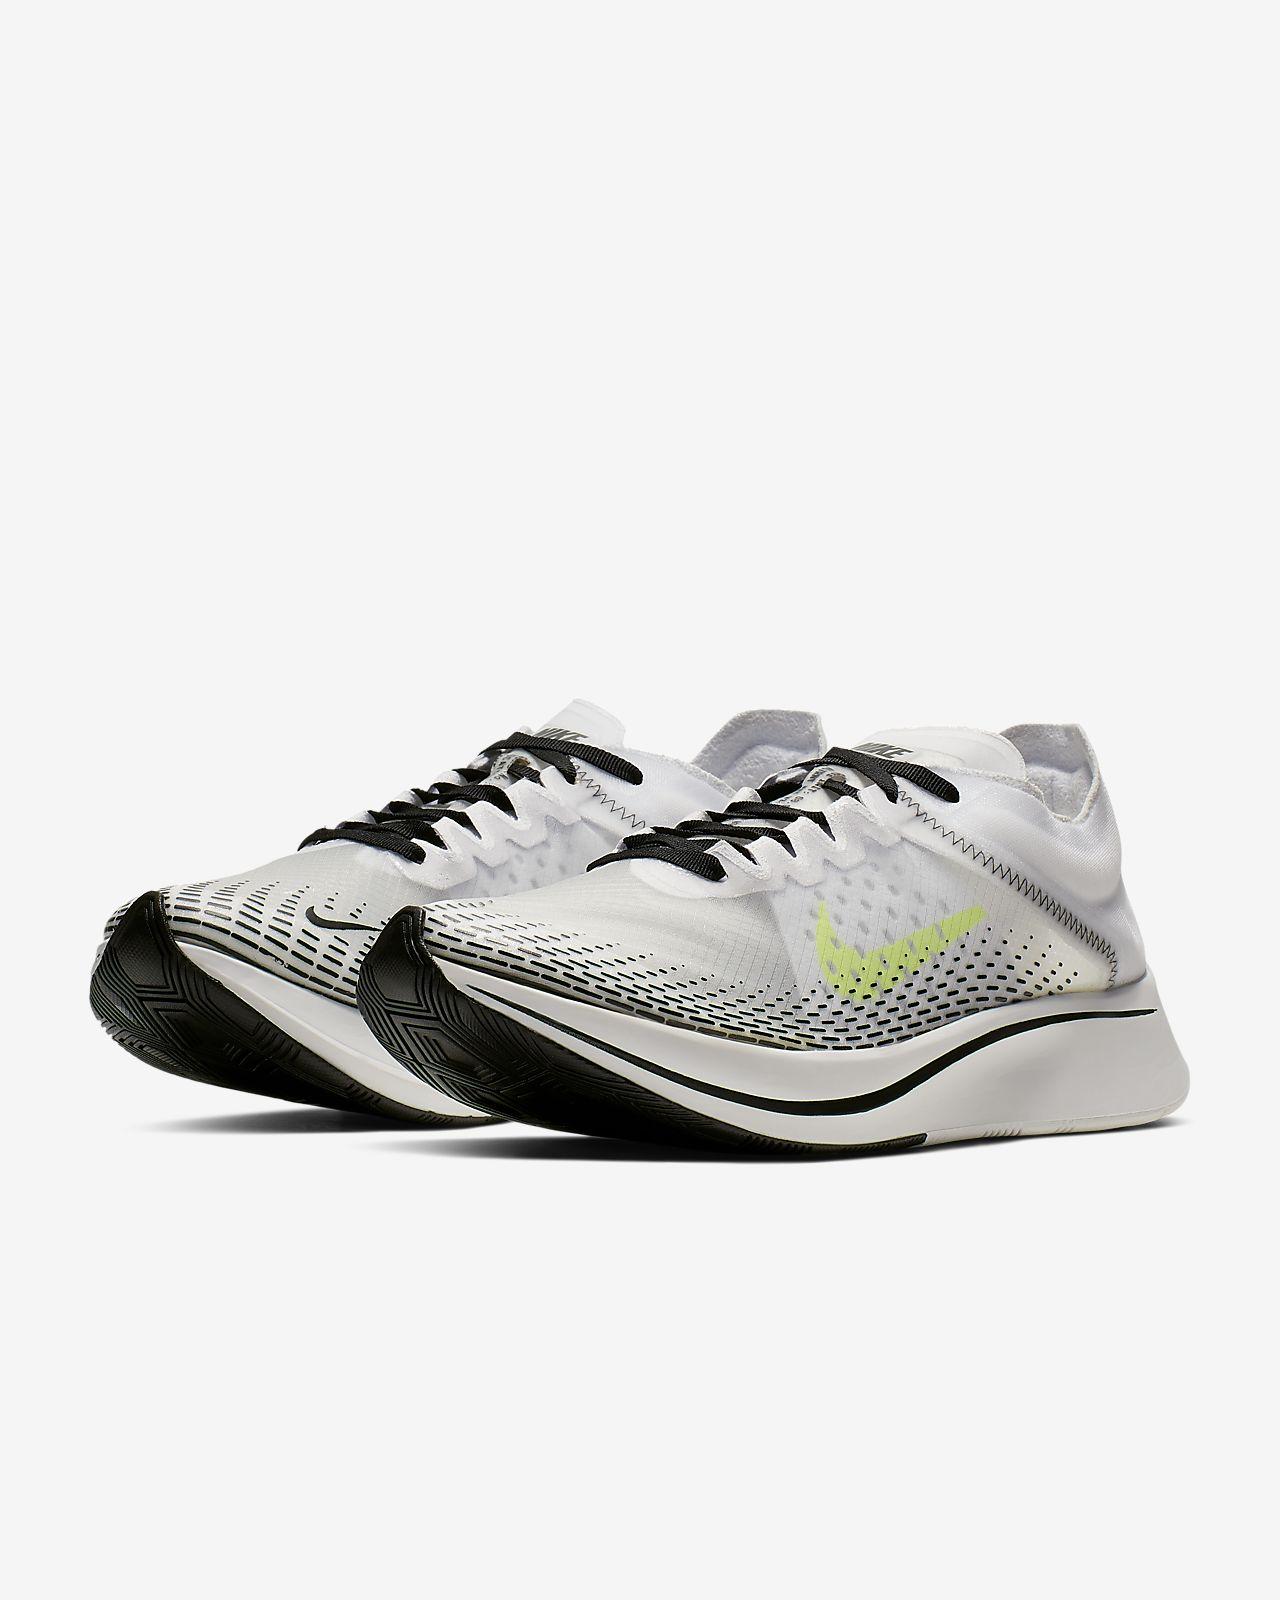 8ec42ec448c Nike Zoom Fly SP Fast Running Shoe. Nike.com GB